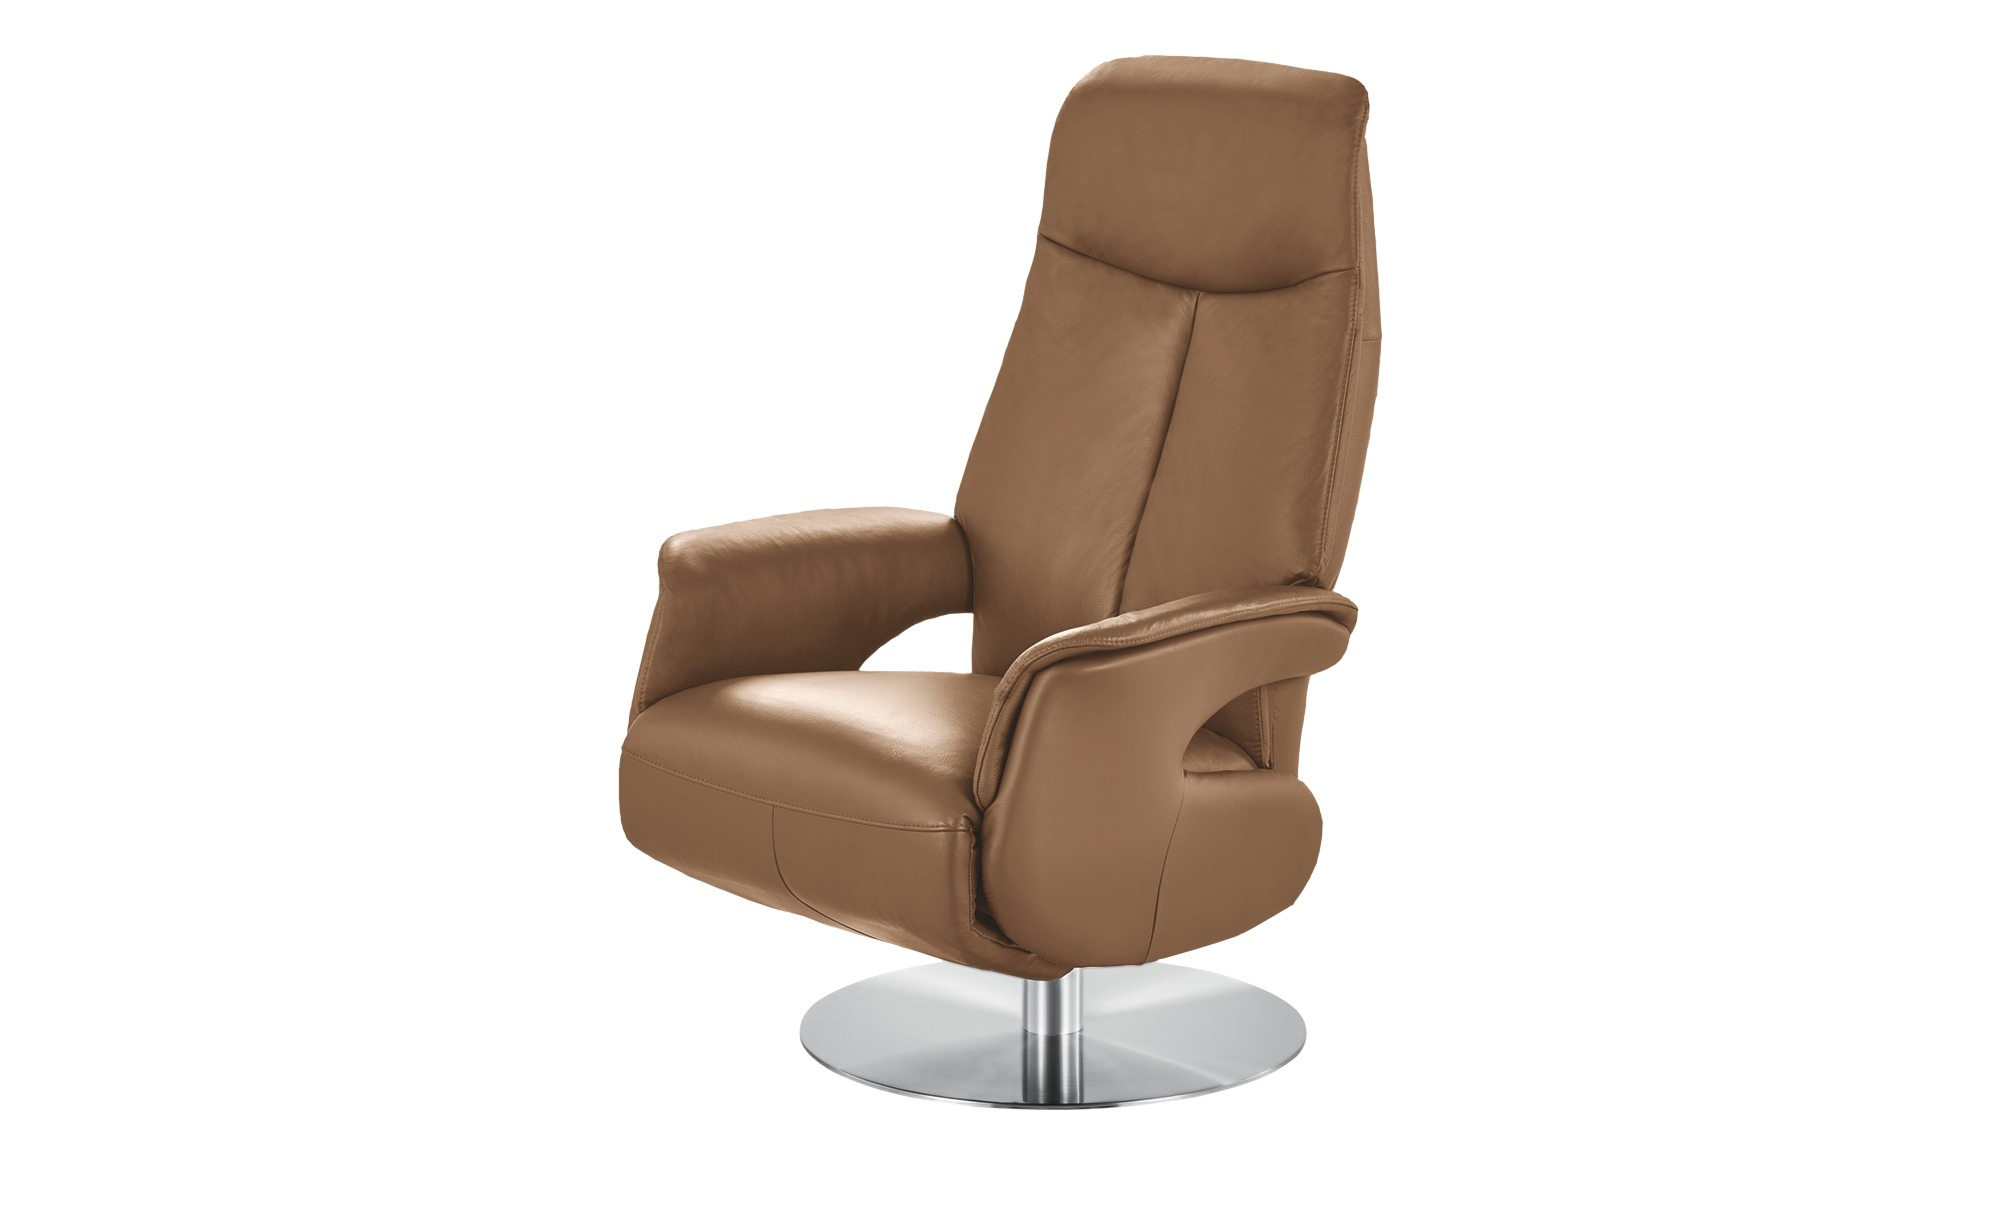 Relaxsessel braun - Leder Nils ¦ braun ¦ Maße (cm): B: 70 H: 111 T: 79 Polstermöbel > Sessel > Fernsehsessel - Höffner